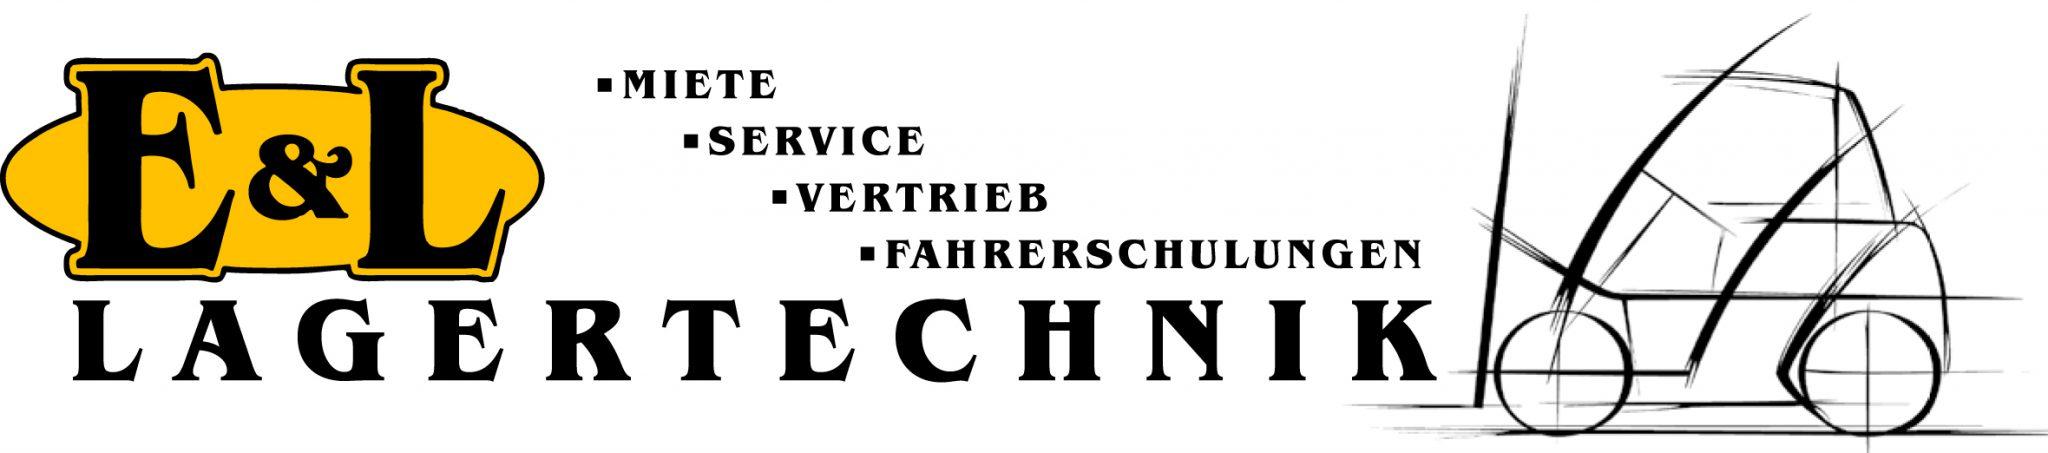 E & L Lagertechnik GmbH